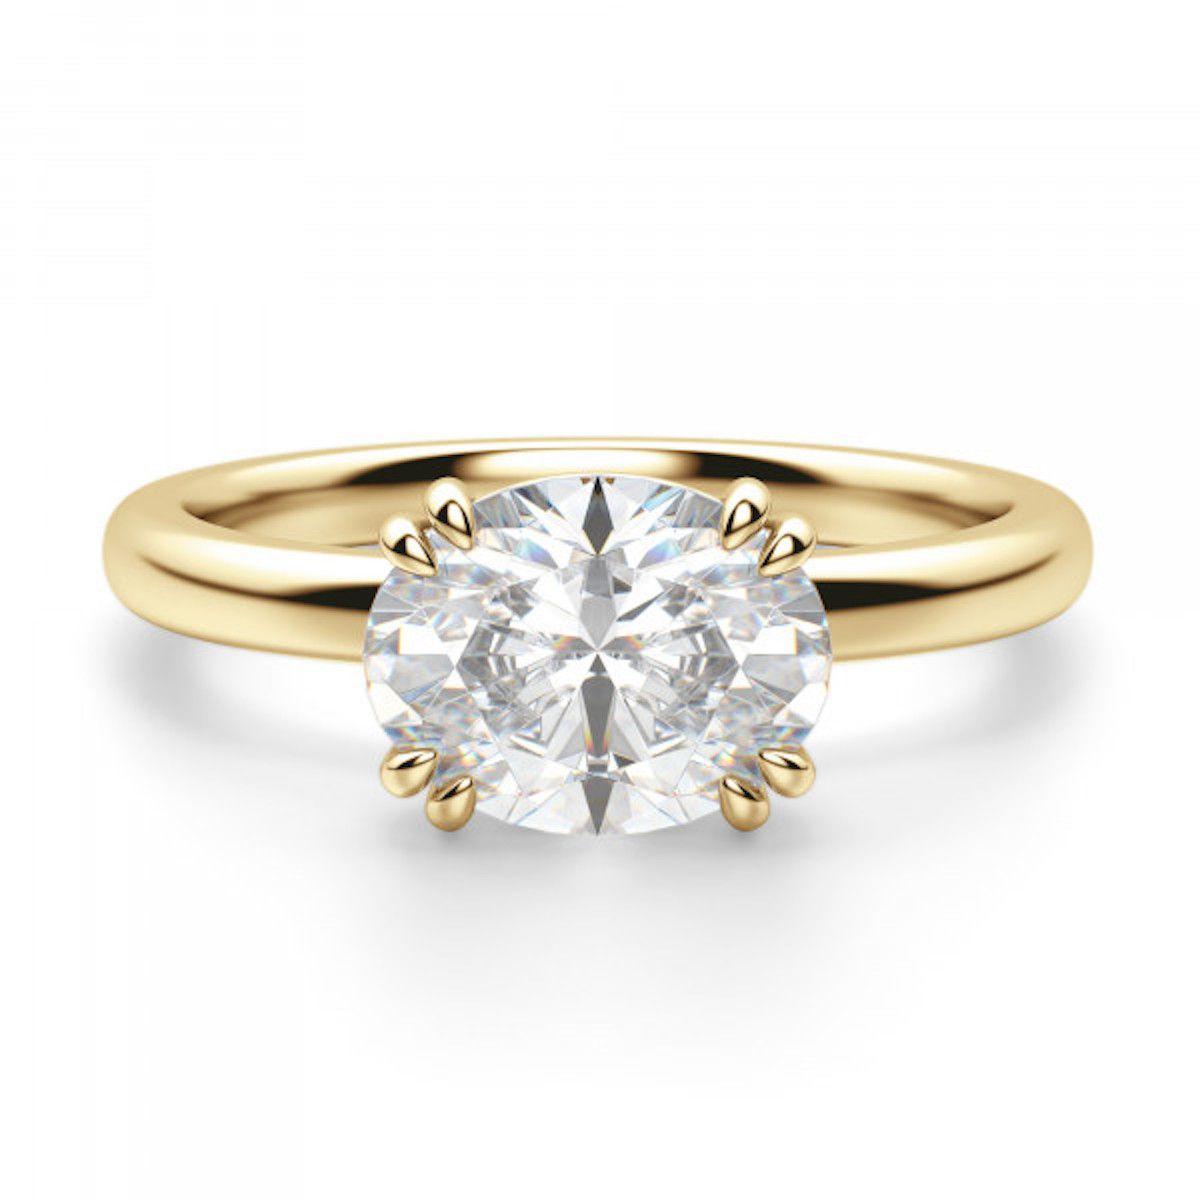 dbc197c48e685 87 Gorgeous Engagement Rings Under $2,000